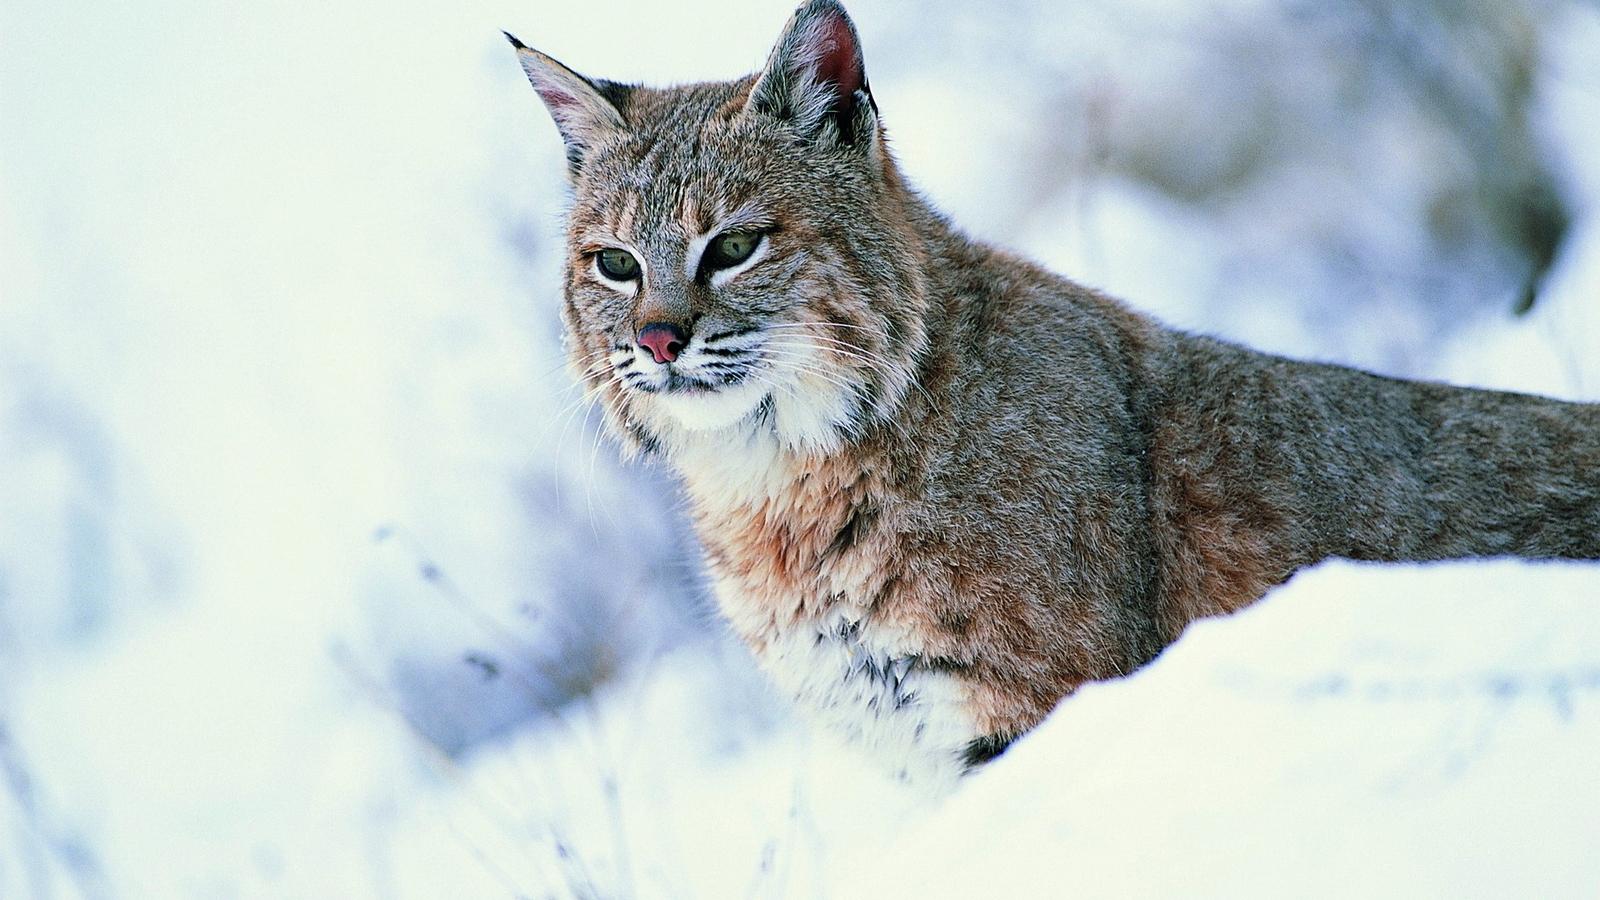 Картинка: Рысь, зима, снег